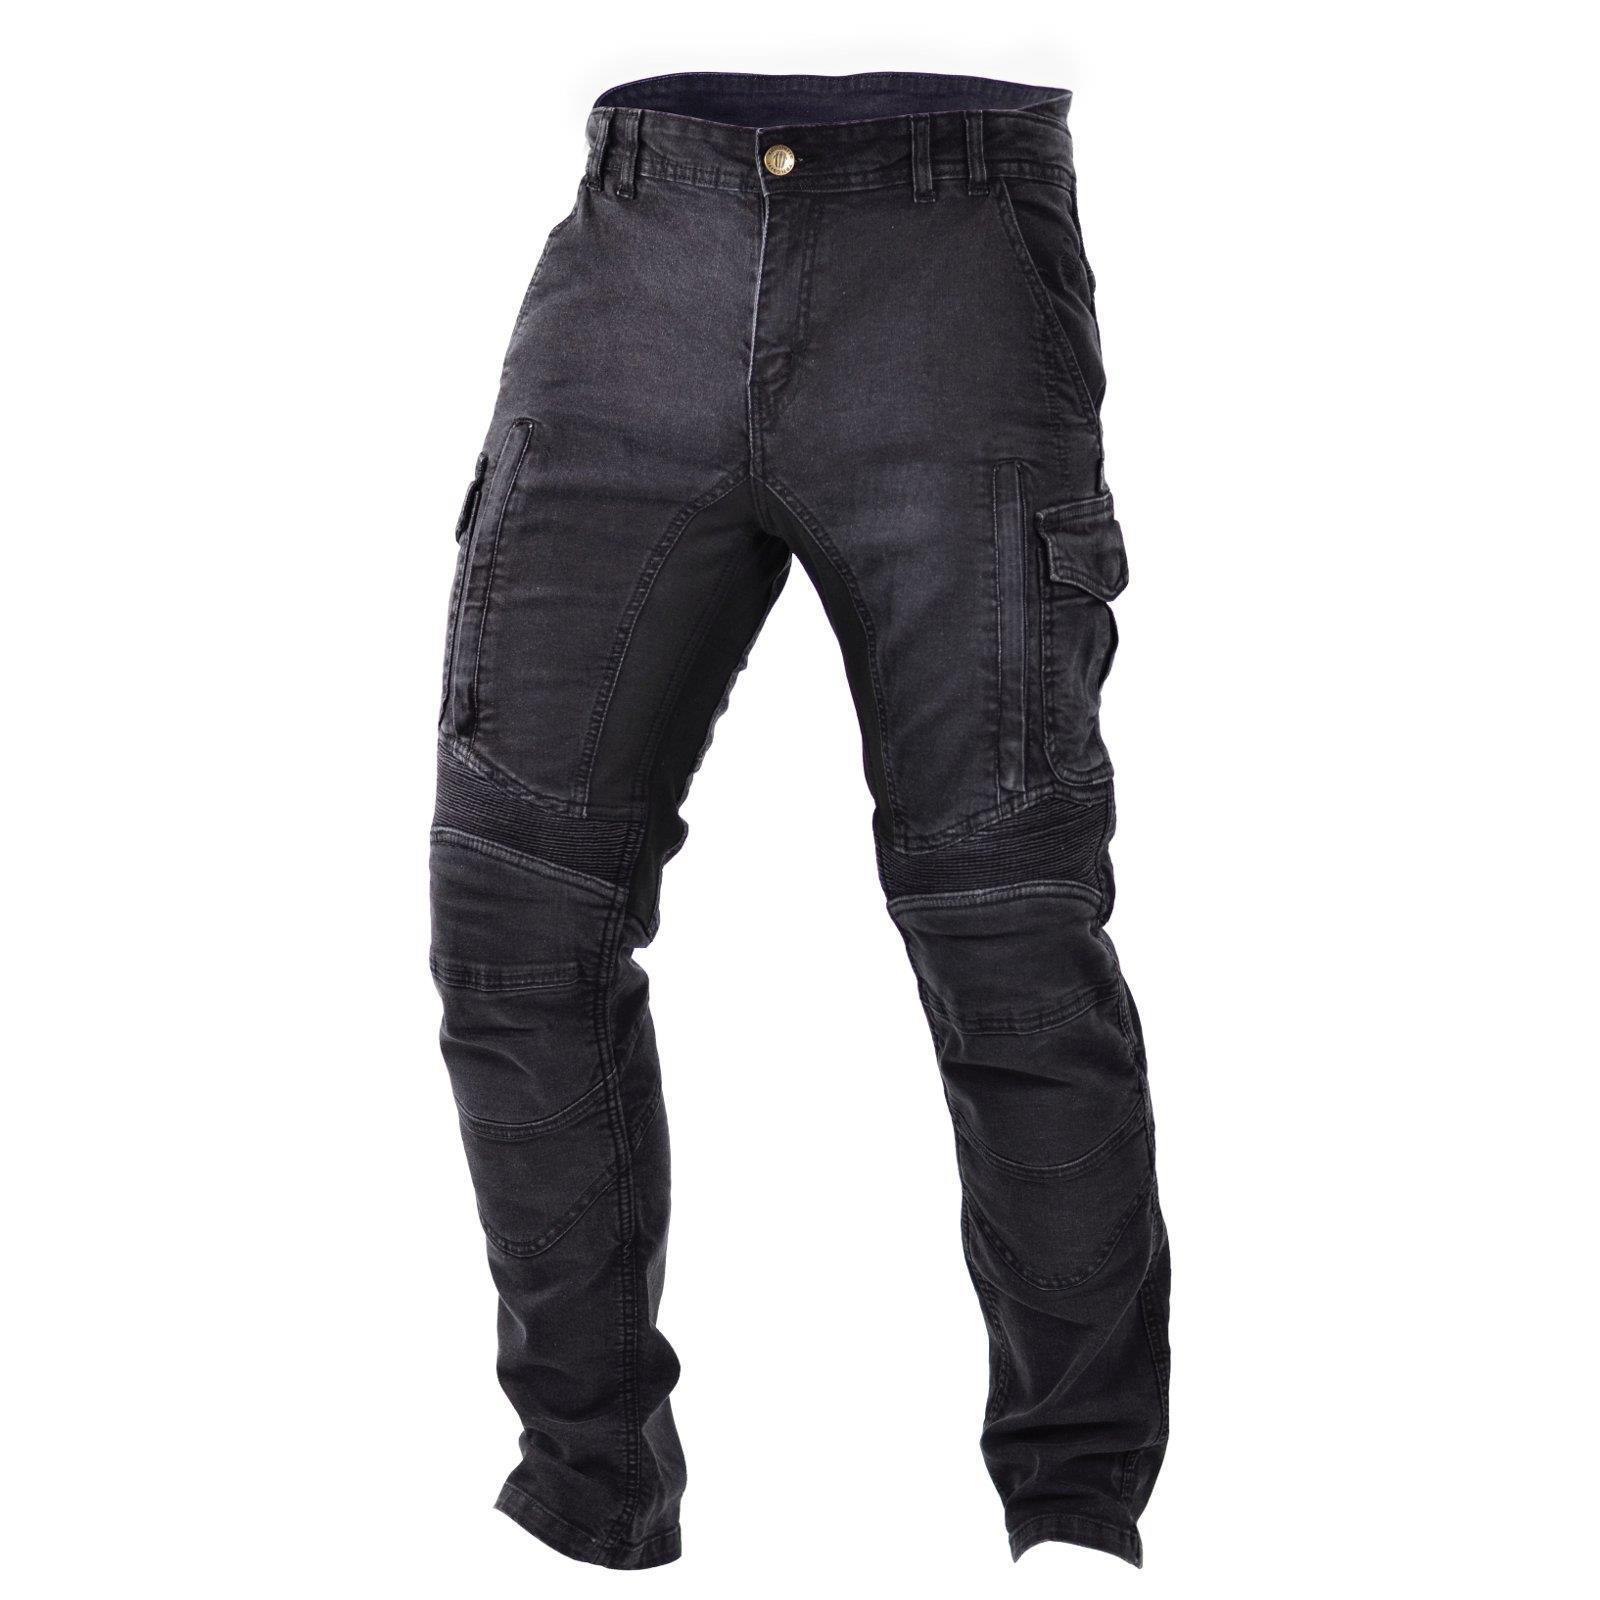 trilobite acid scrambler herren motorrad jeans schwarz. Black Bedroom Furniture Sets. Home Design Ideas